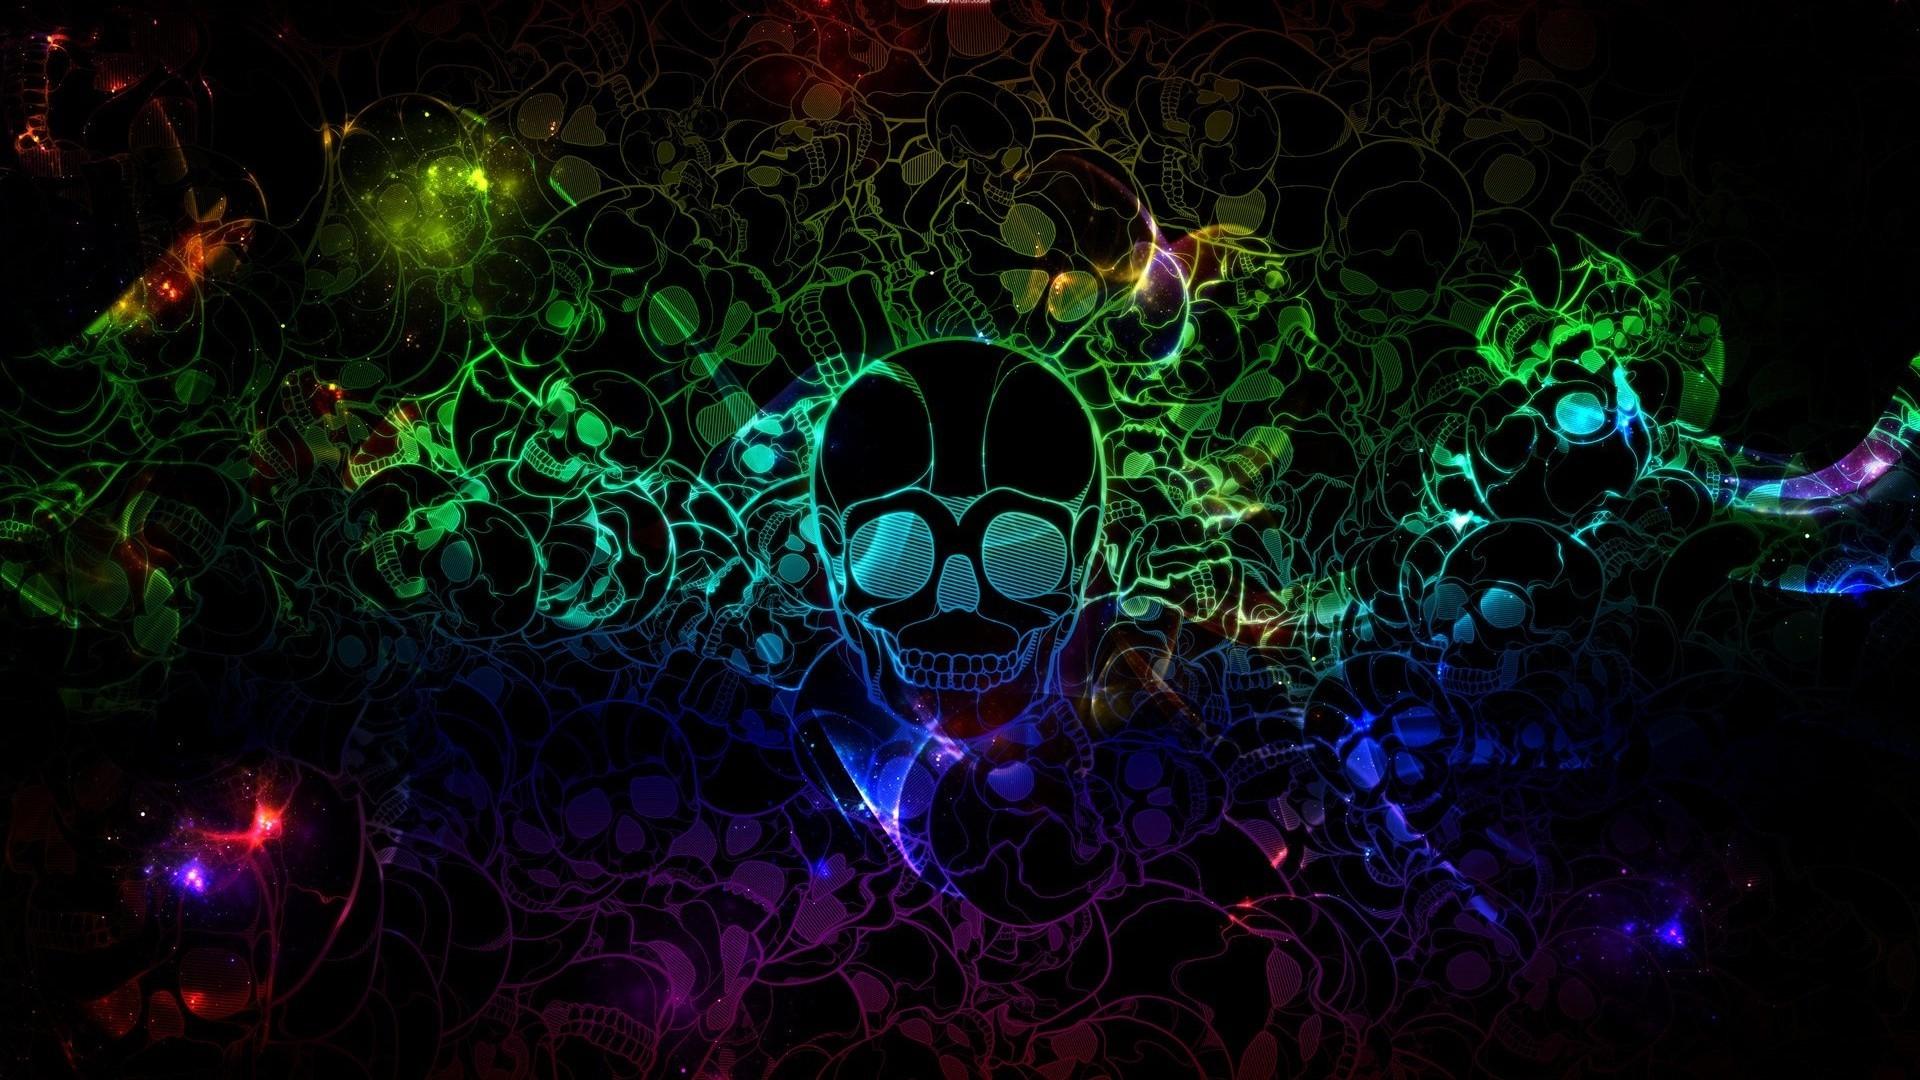 Cool Backgrounds Of Skulls - WallpaperSafari